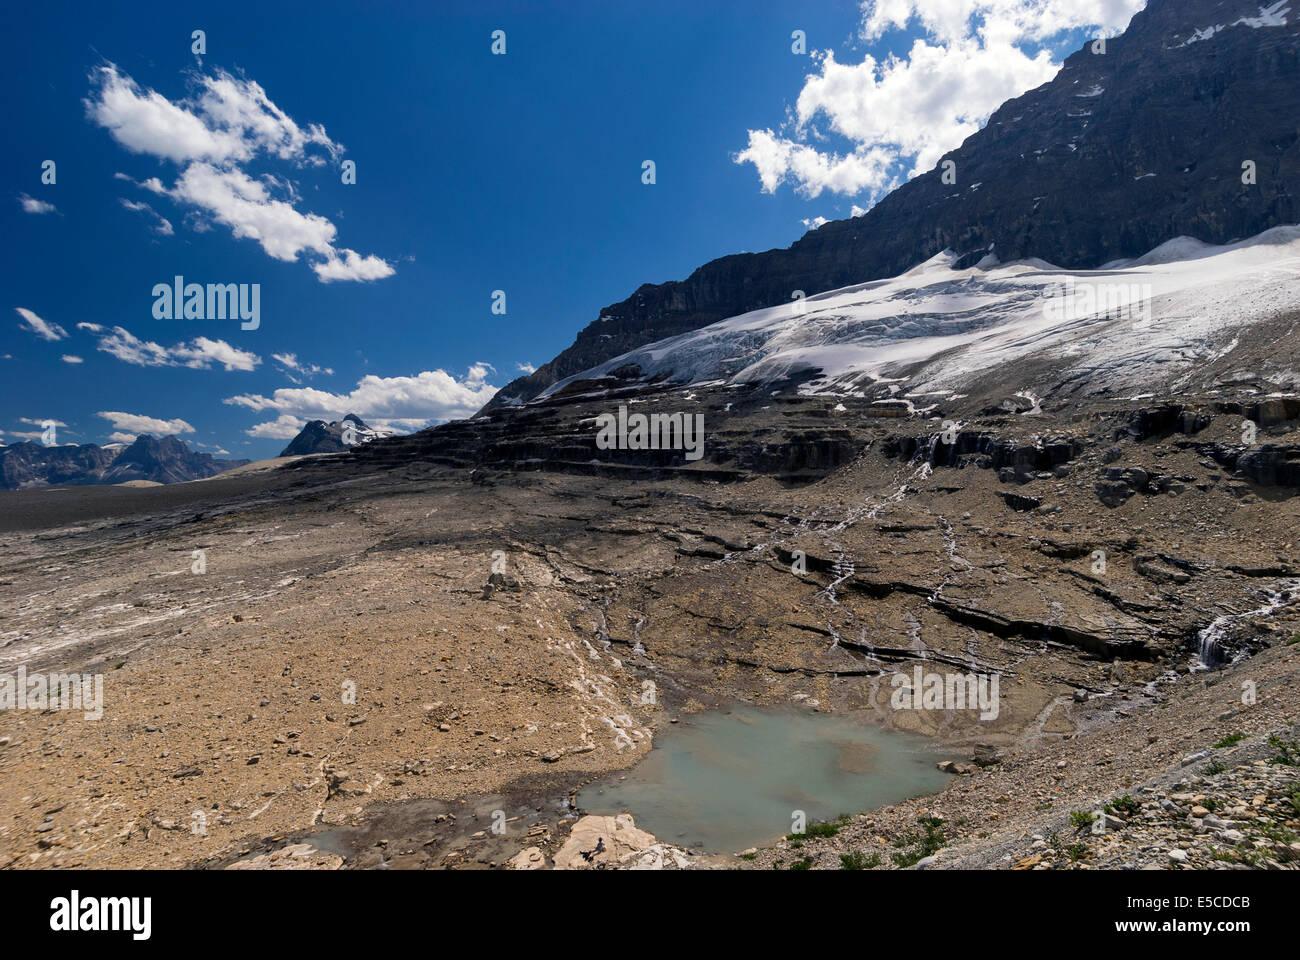 Elk203-2133 Canada, British Columbia, Yoho National Park, Iceland Trail, Emerald Glacier - Stock Image